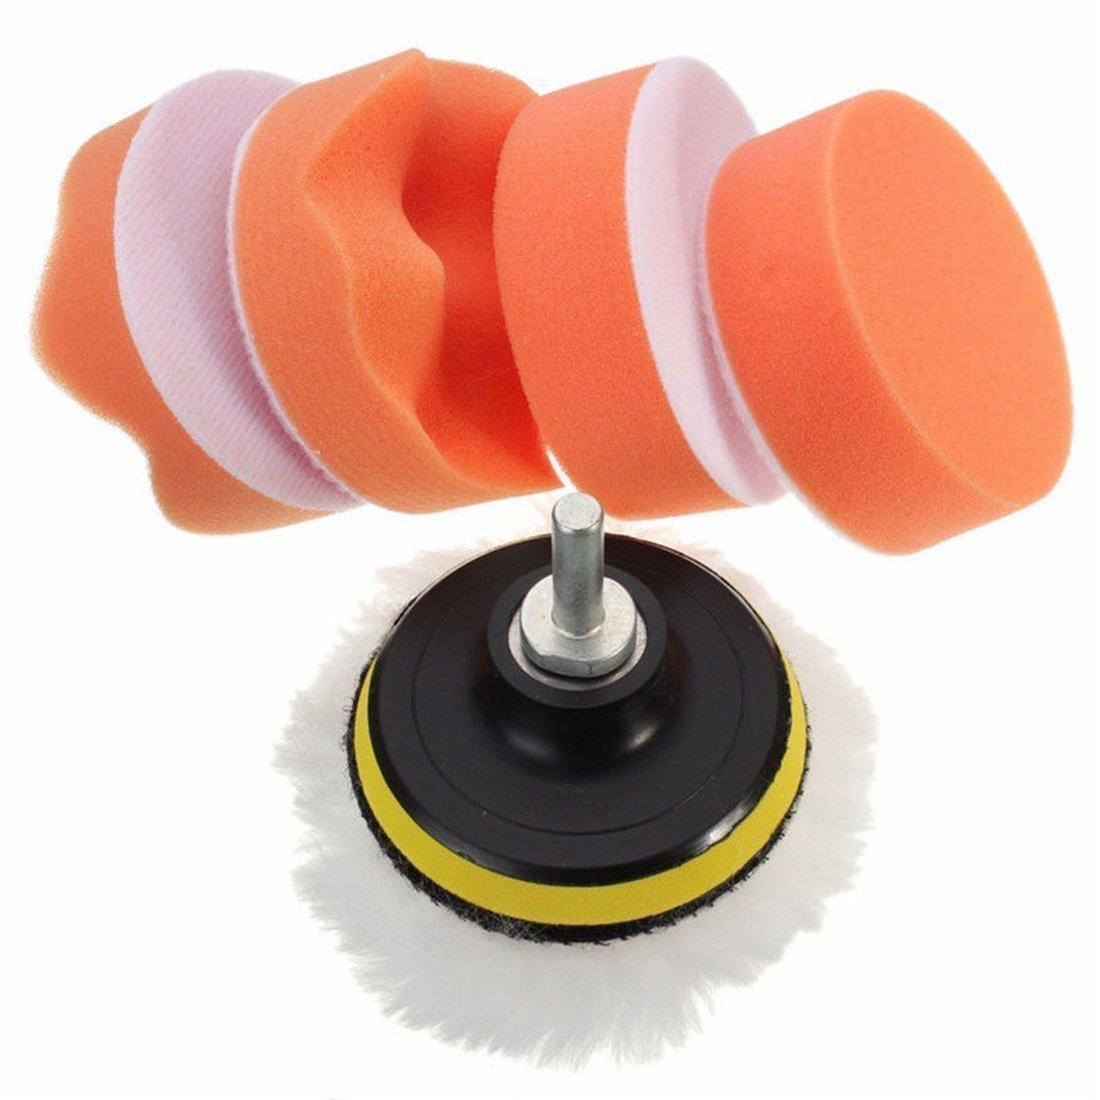 Buffing sponge - TOOGOO(R)M14 Car Adapter Kit Drill Polishing pad Pad Sponge Buffer Buffing NEW 3 INCH FEMSALBJBJ038